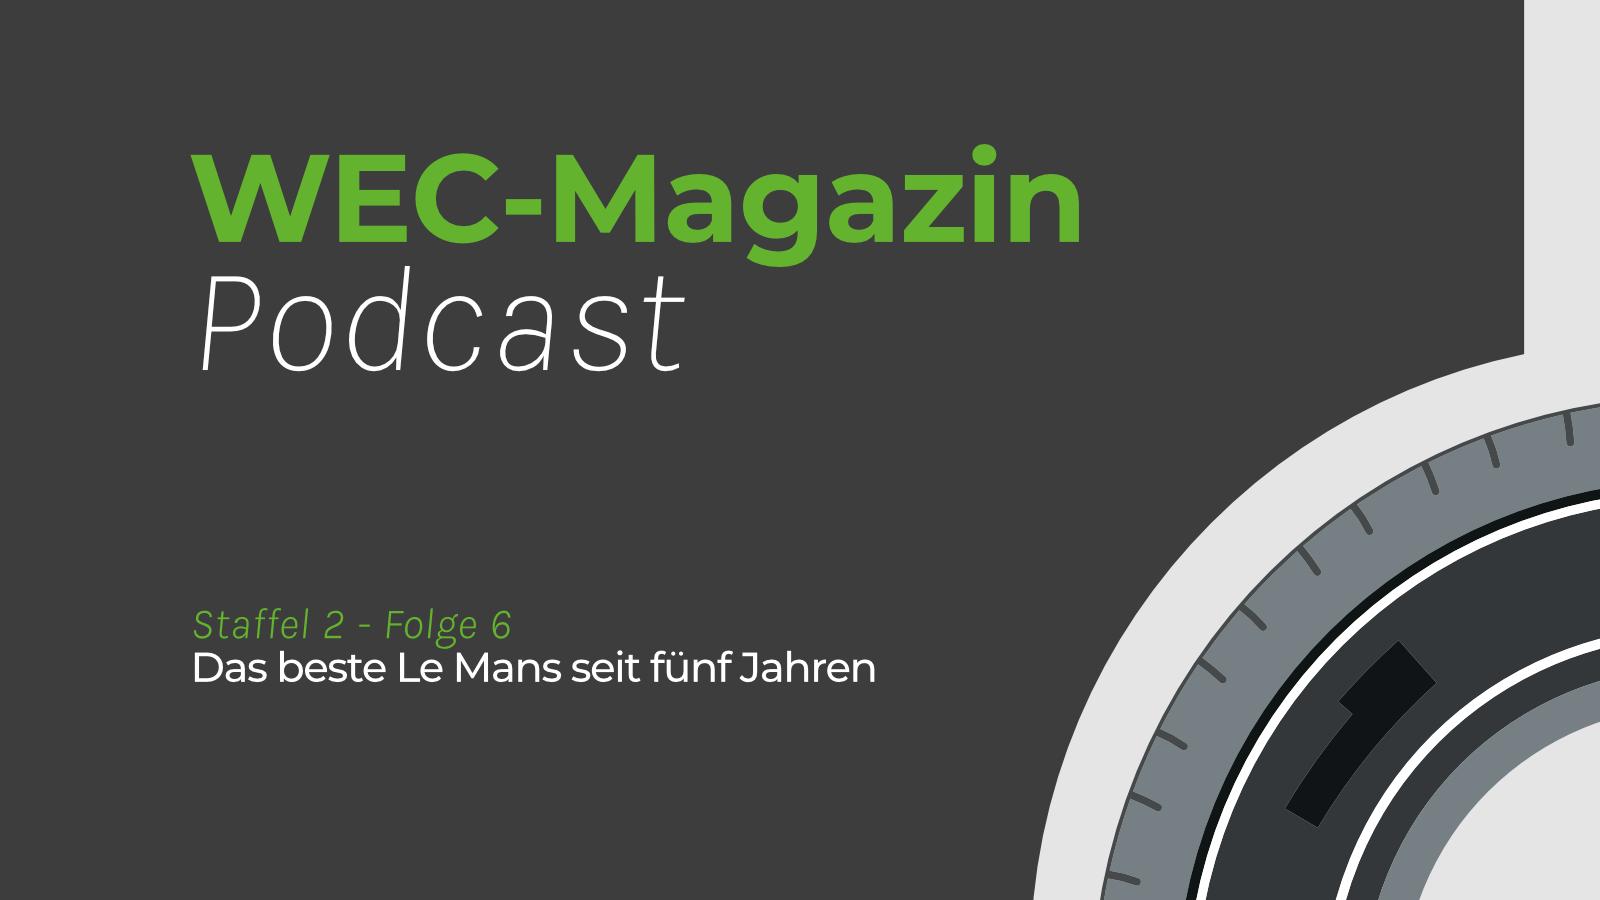 WEC-Magazin Podcast Staffel 02 Folge 06